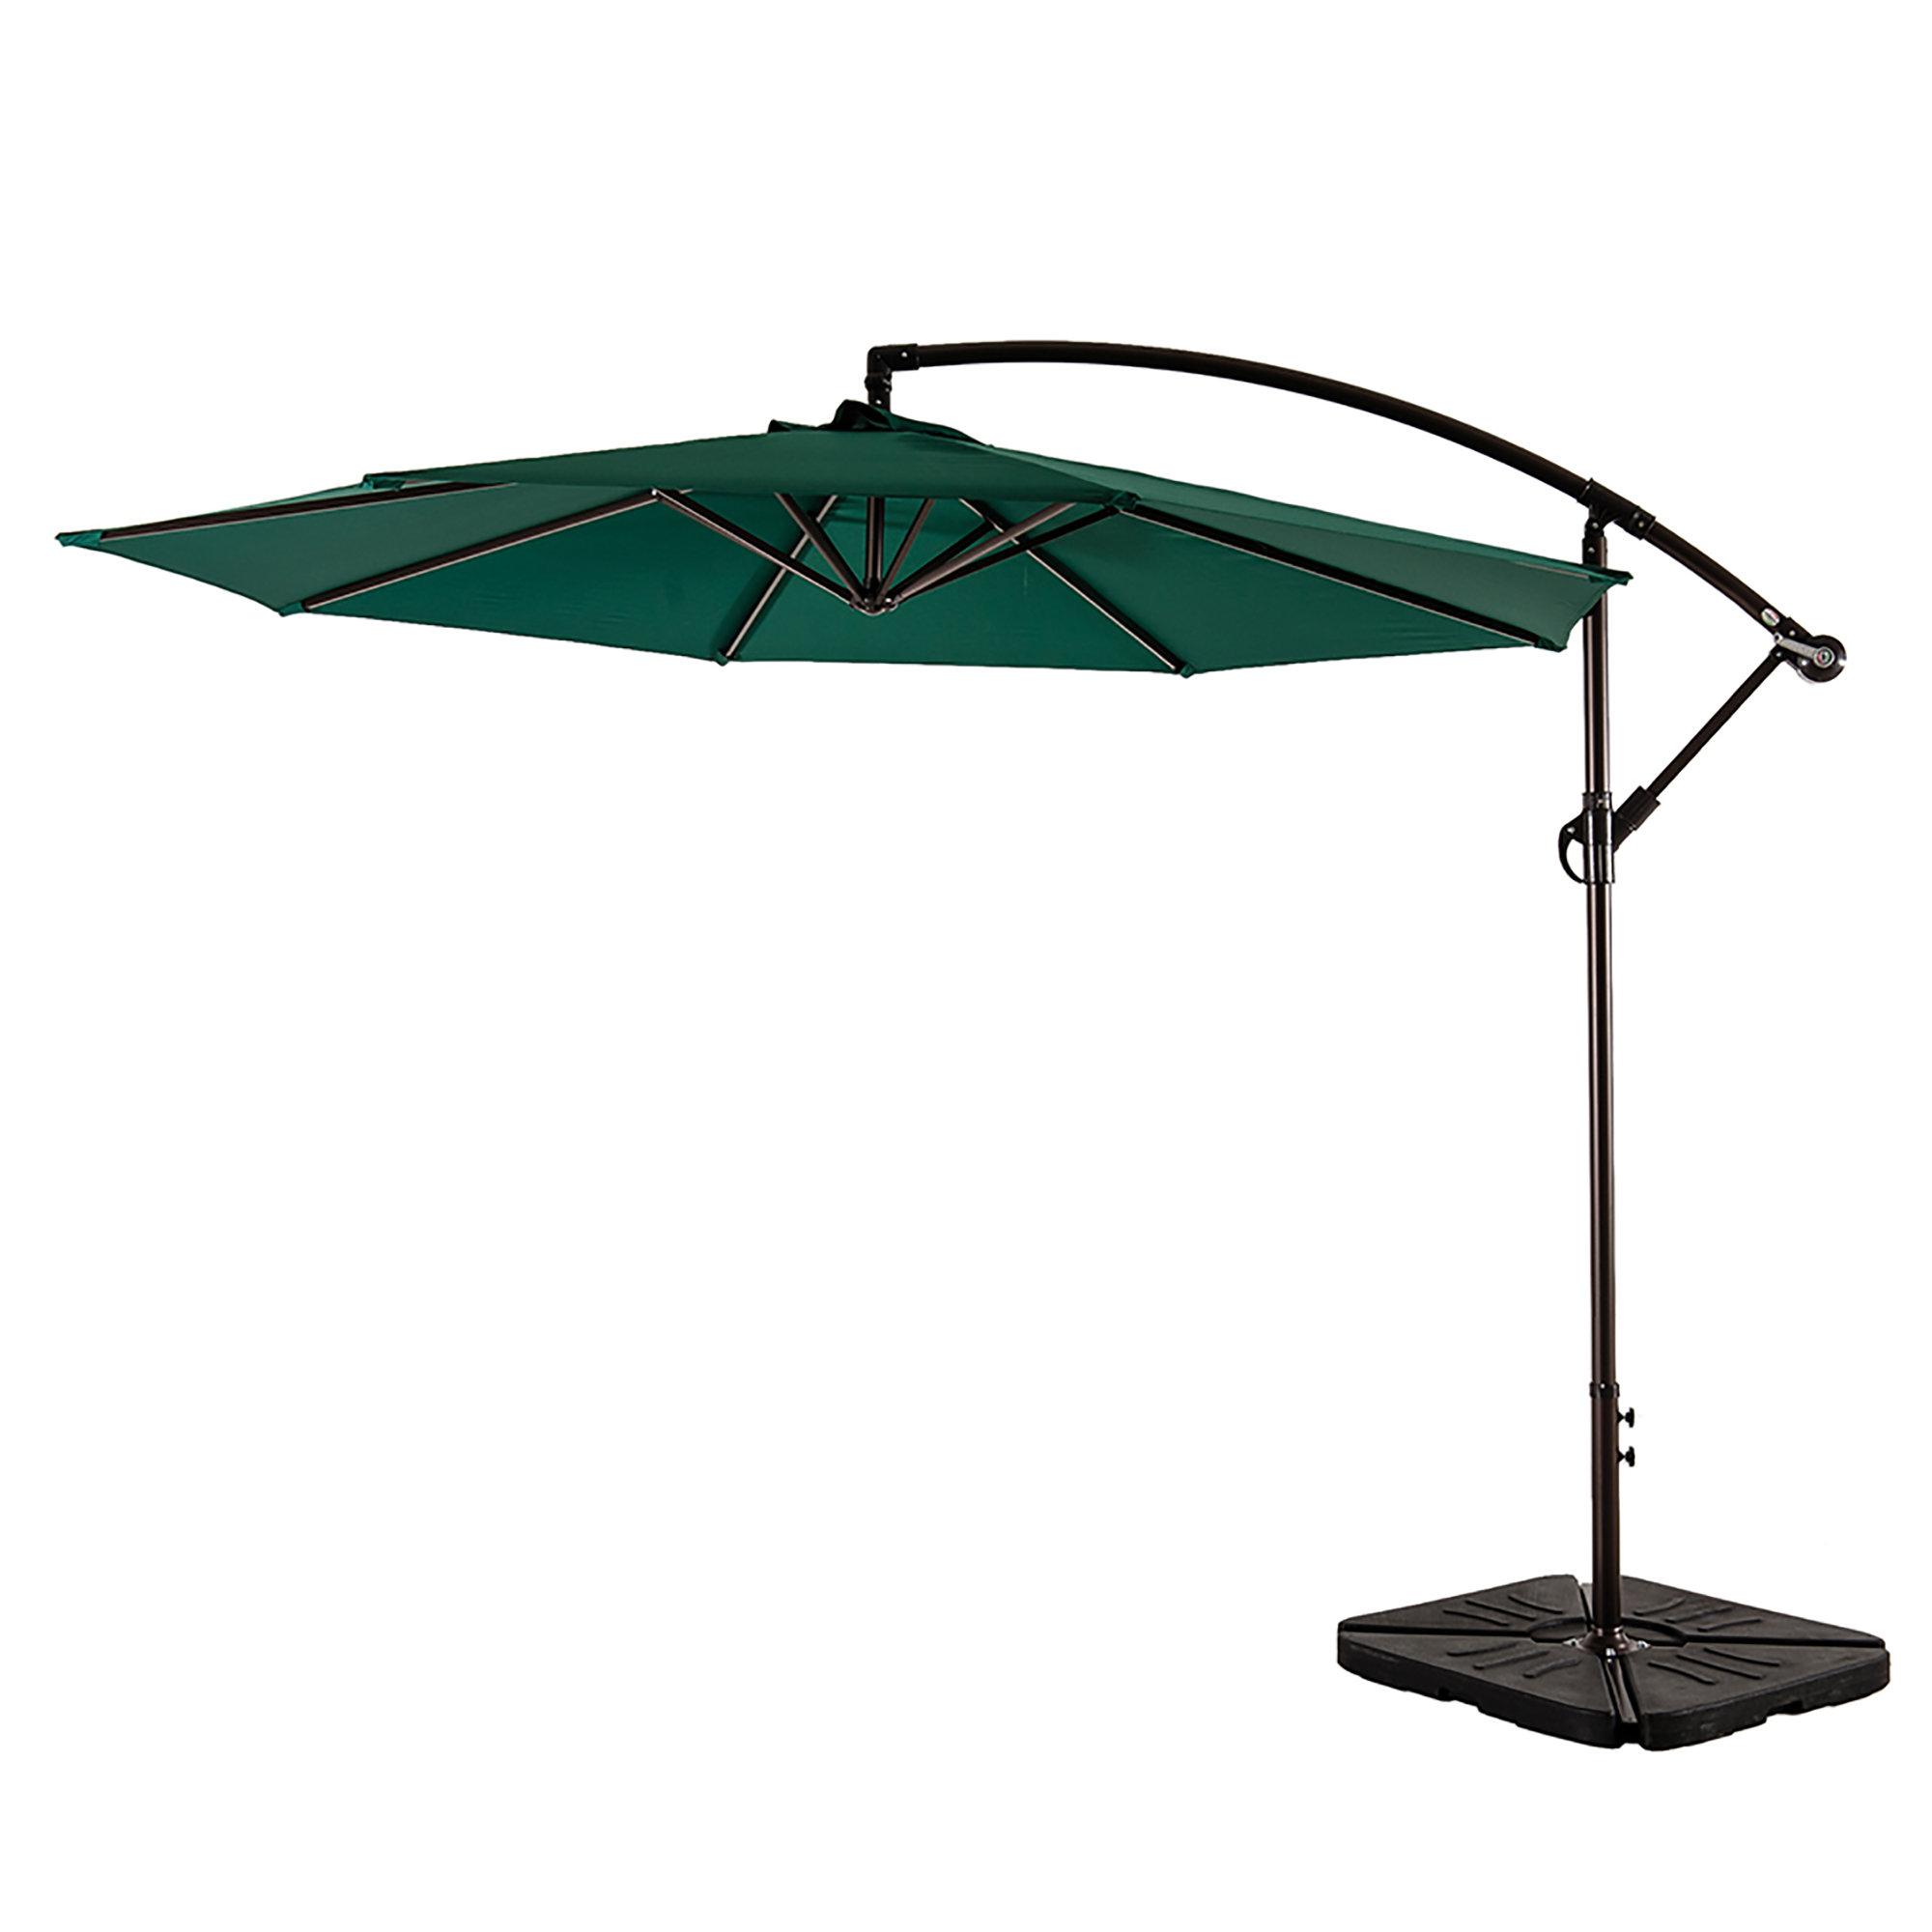 Vassalboro Cantilever Umbrellas Inside Most Recent Karr 10' Cantilever Umbrella (Gallery 18 of 20)